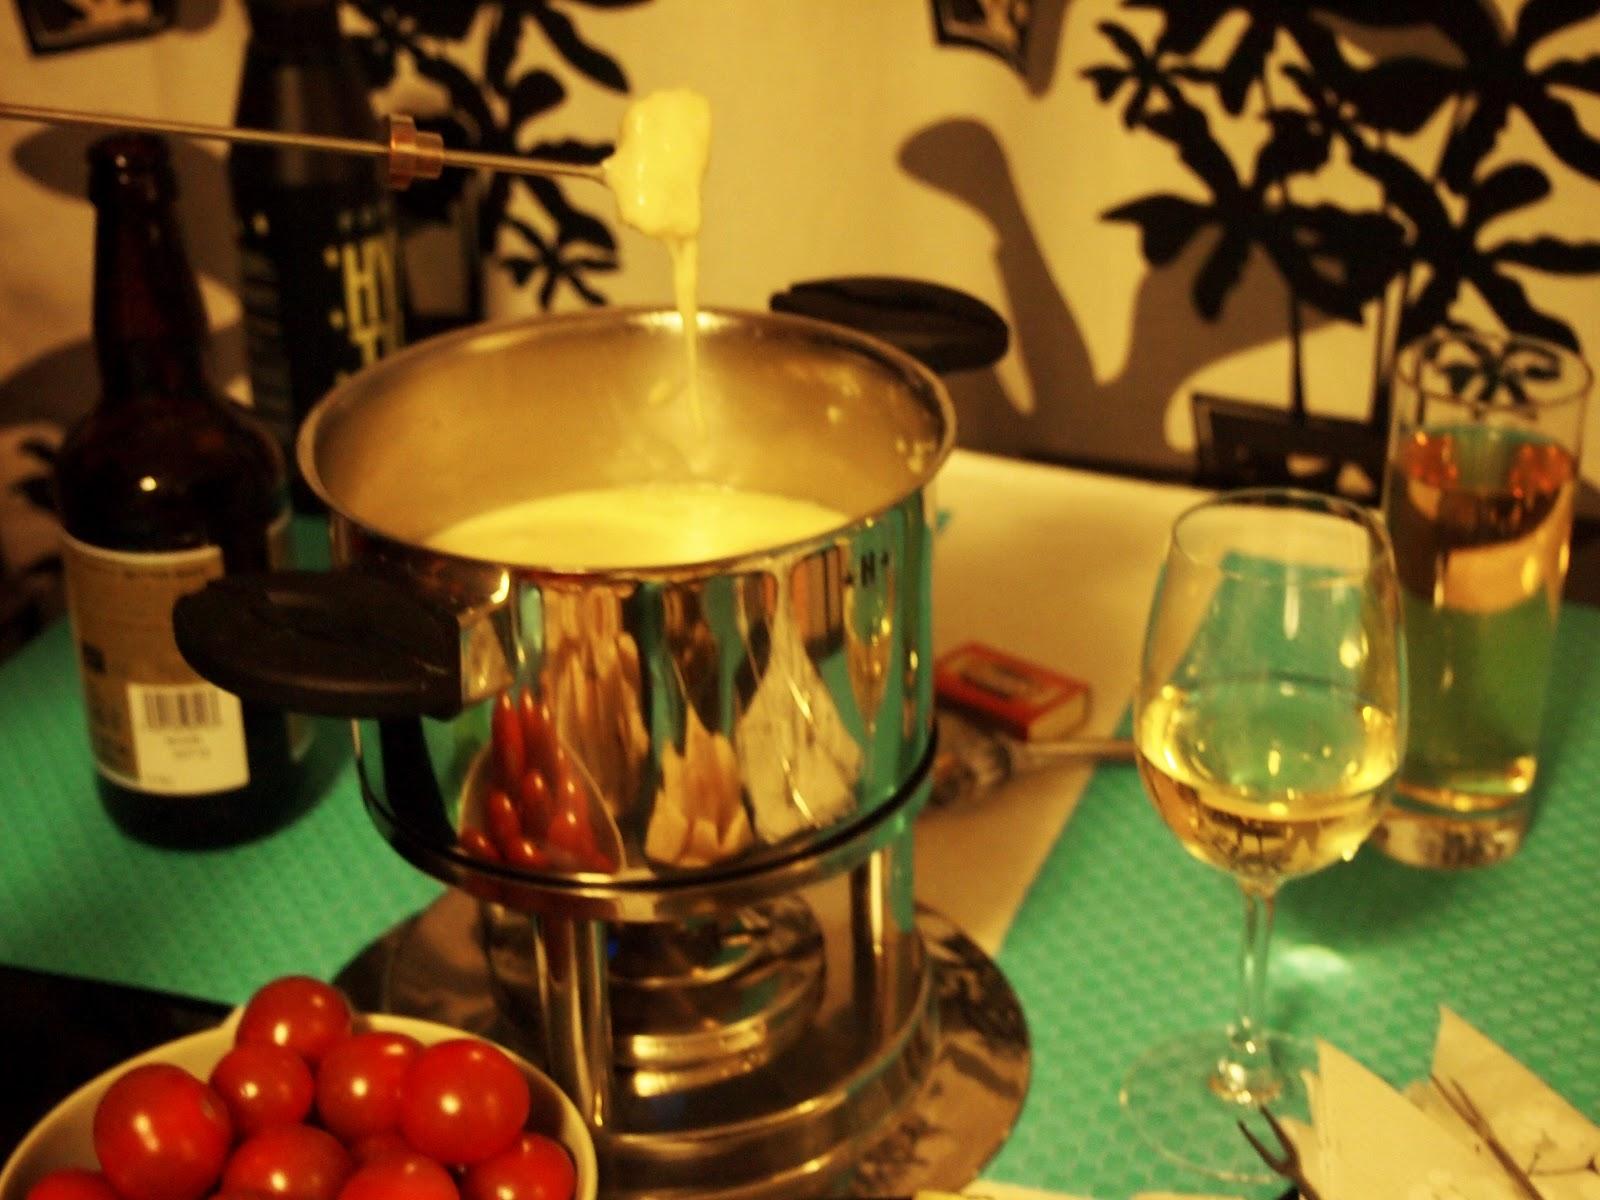 Valmis fondue juusto